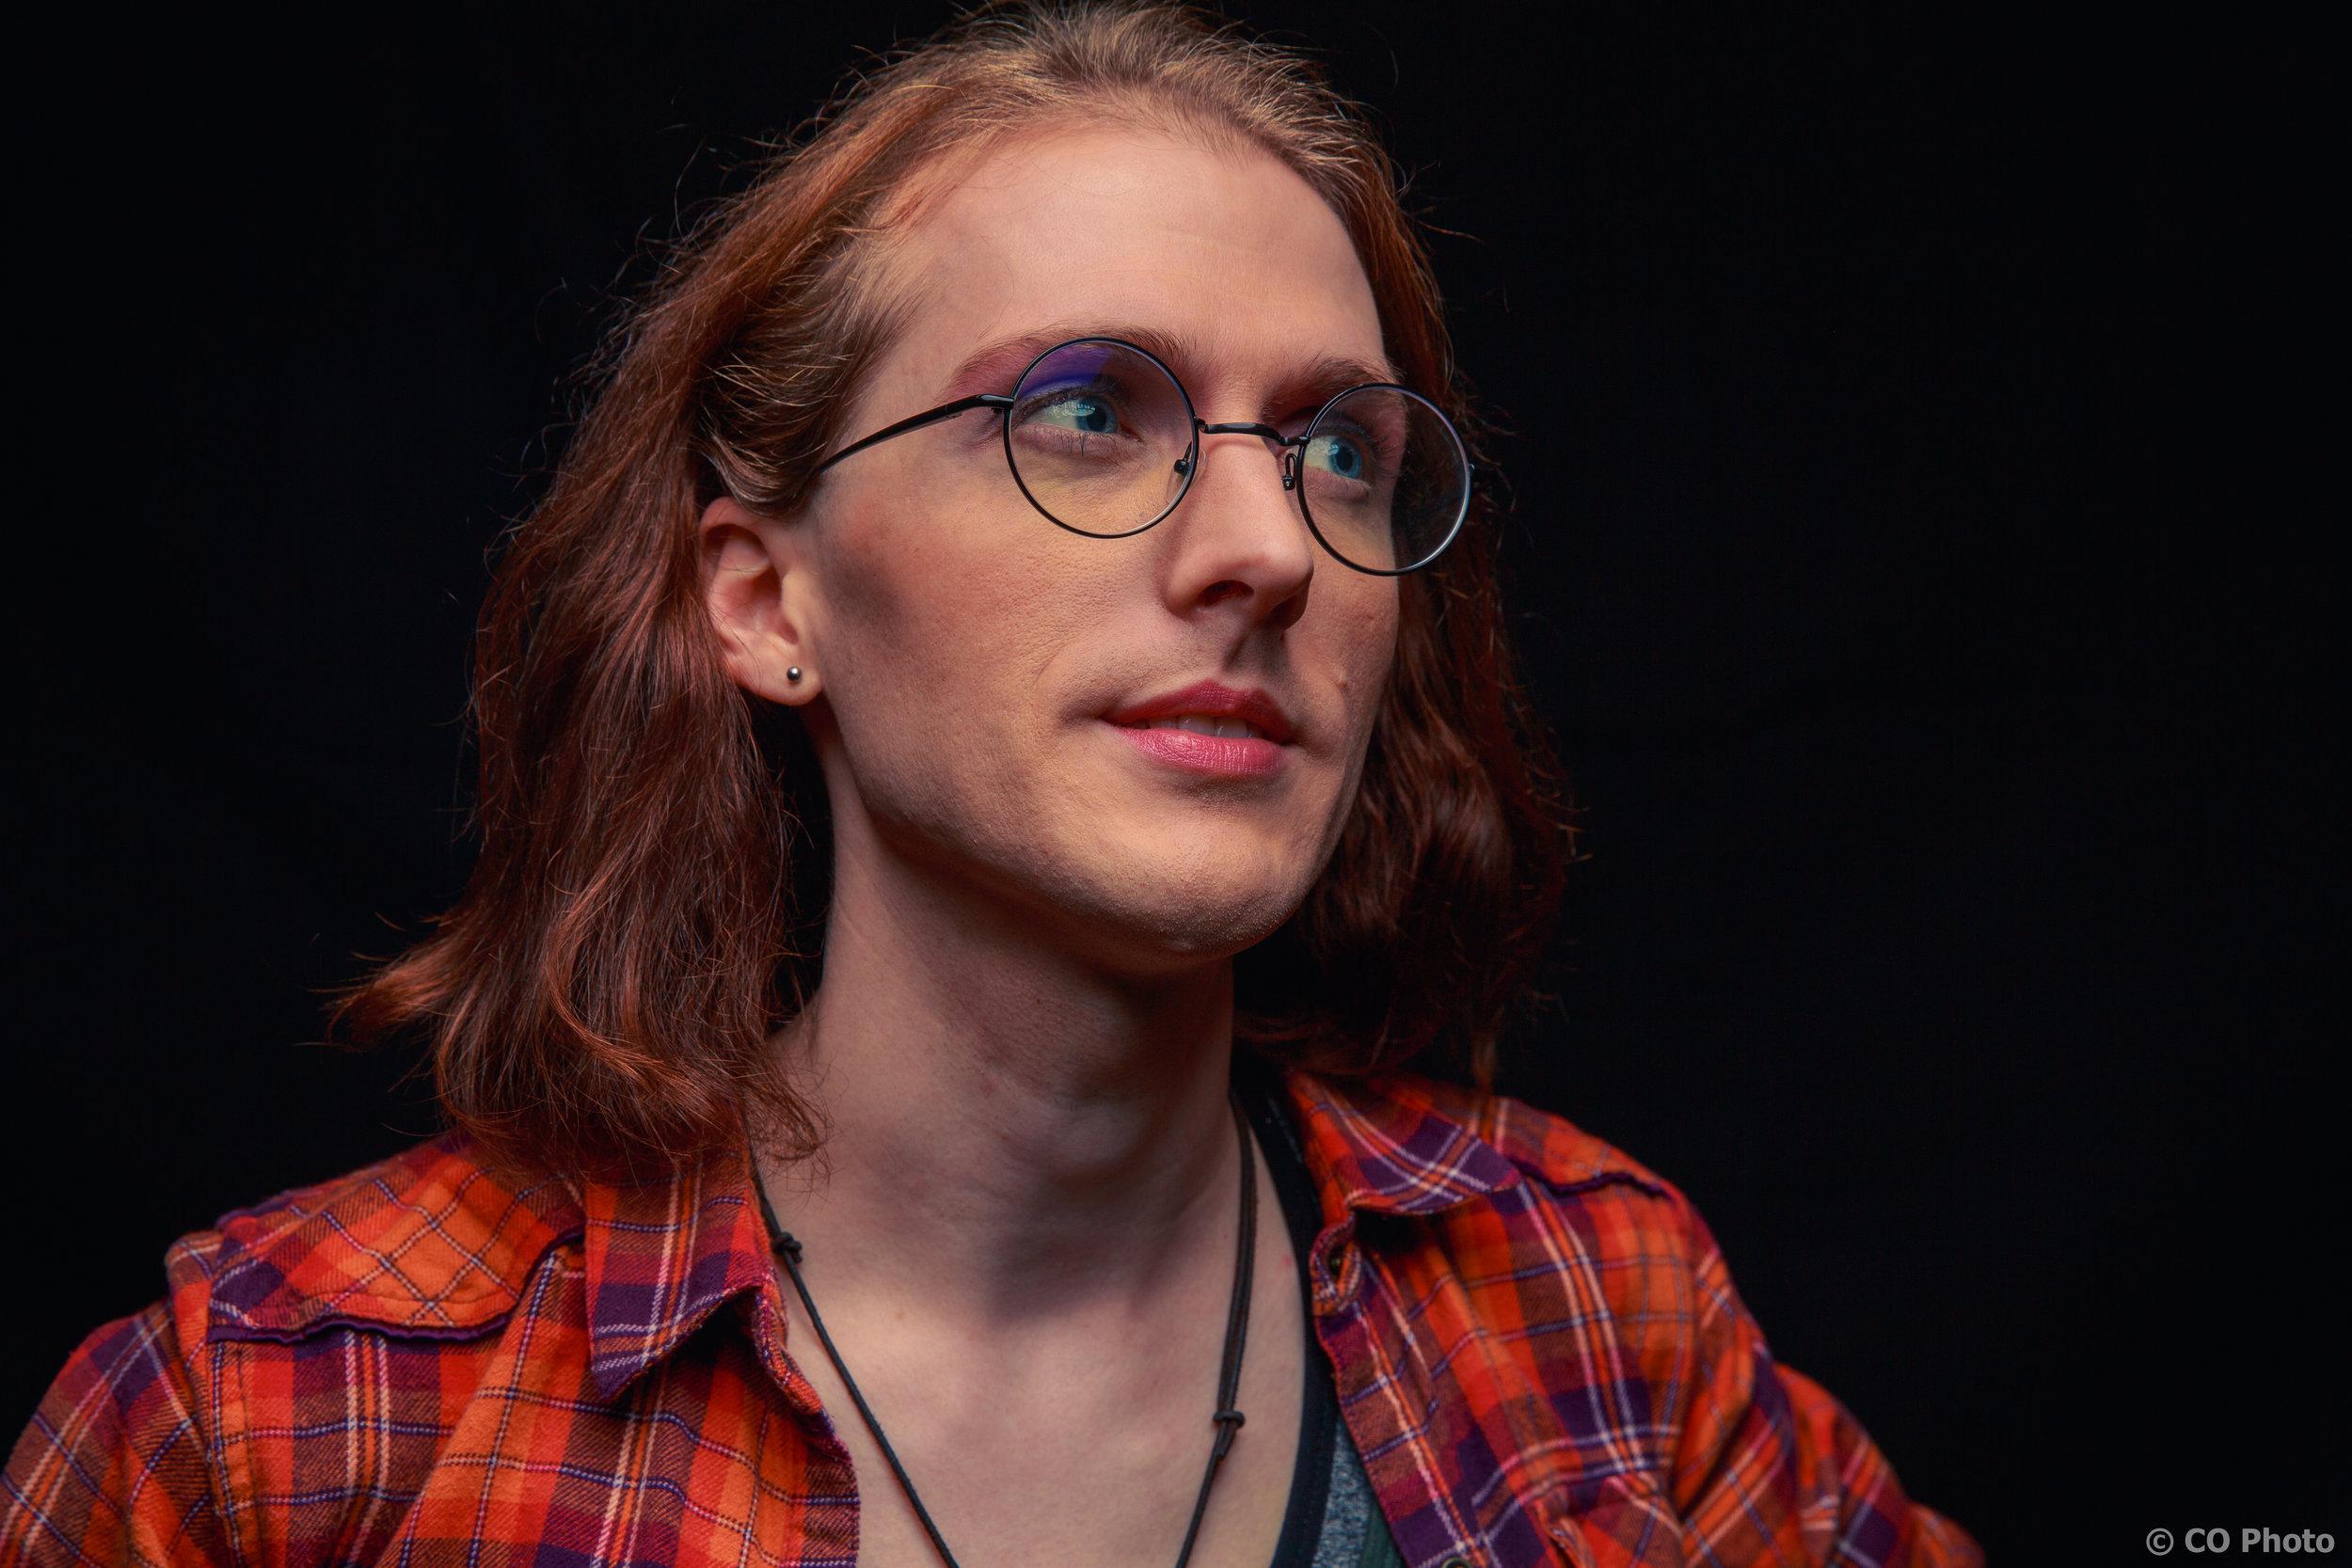 Model: Silas Janzen Lohrenz